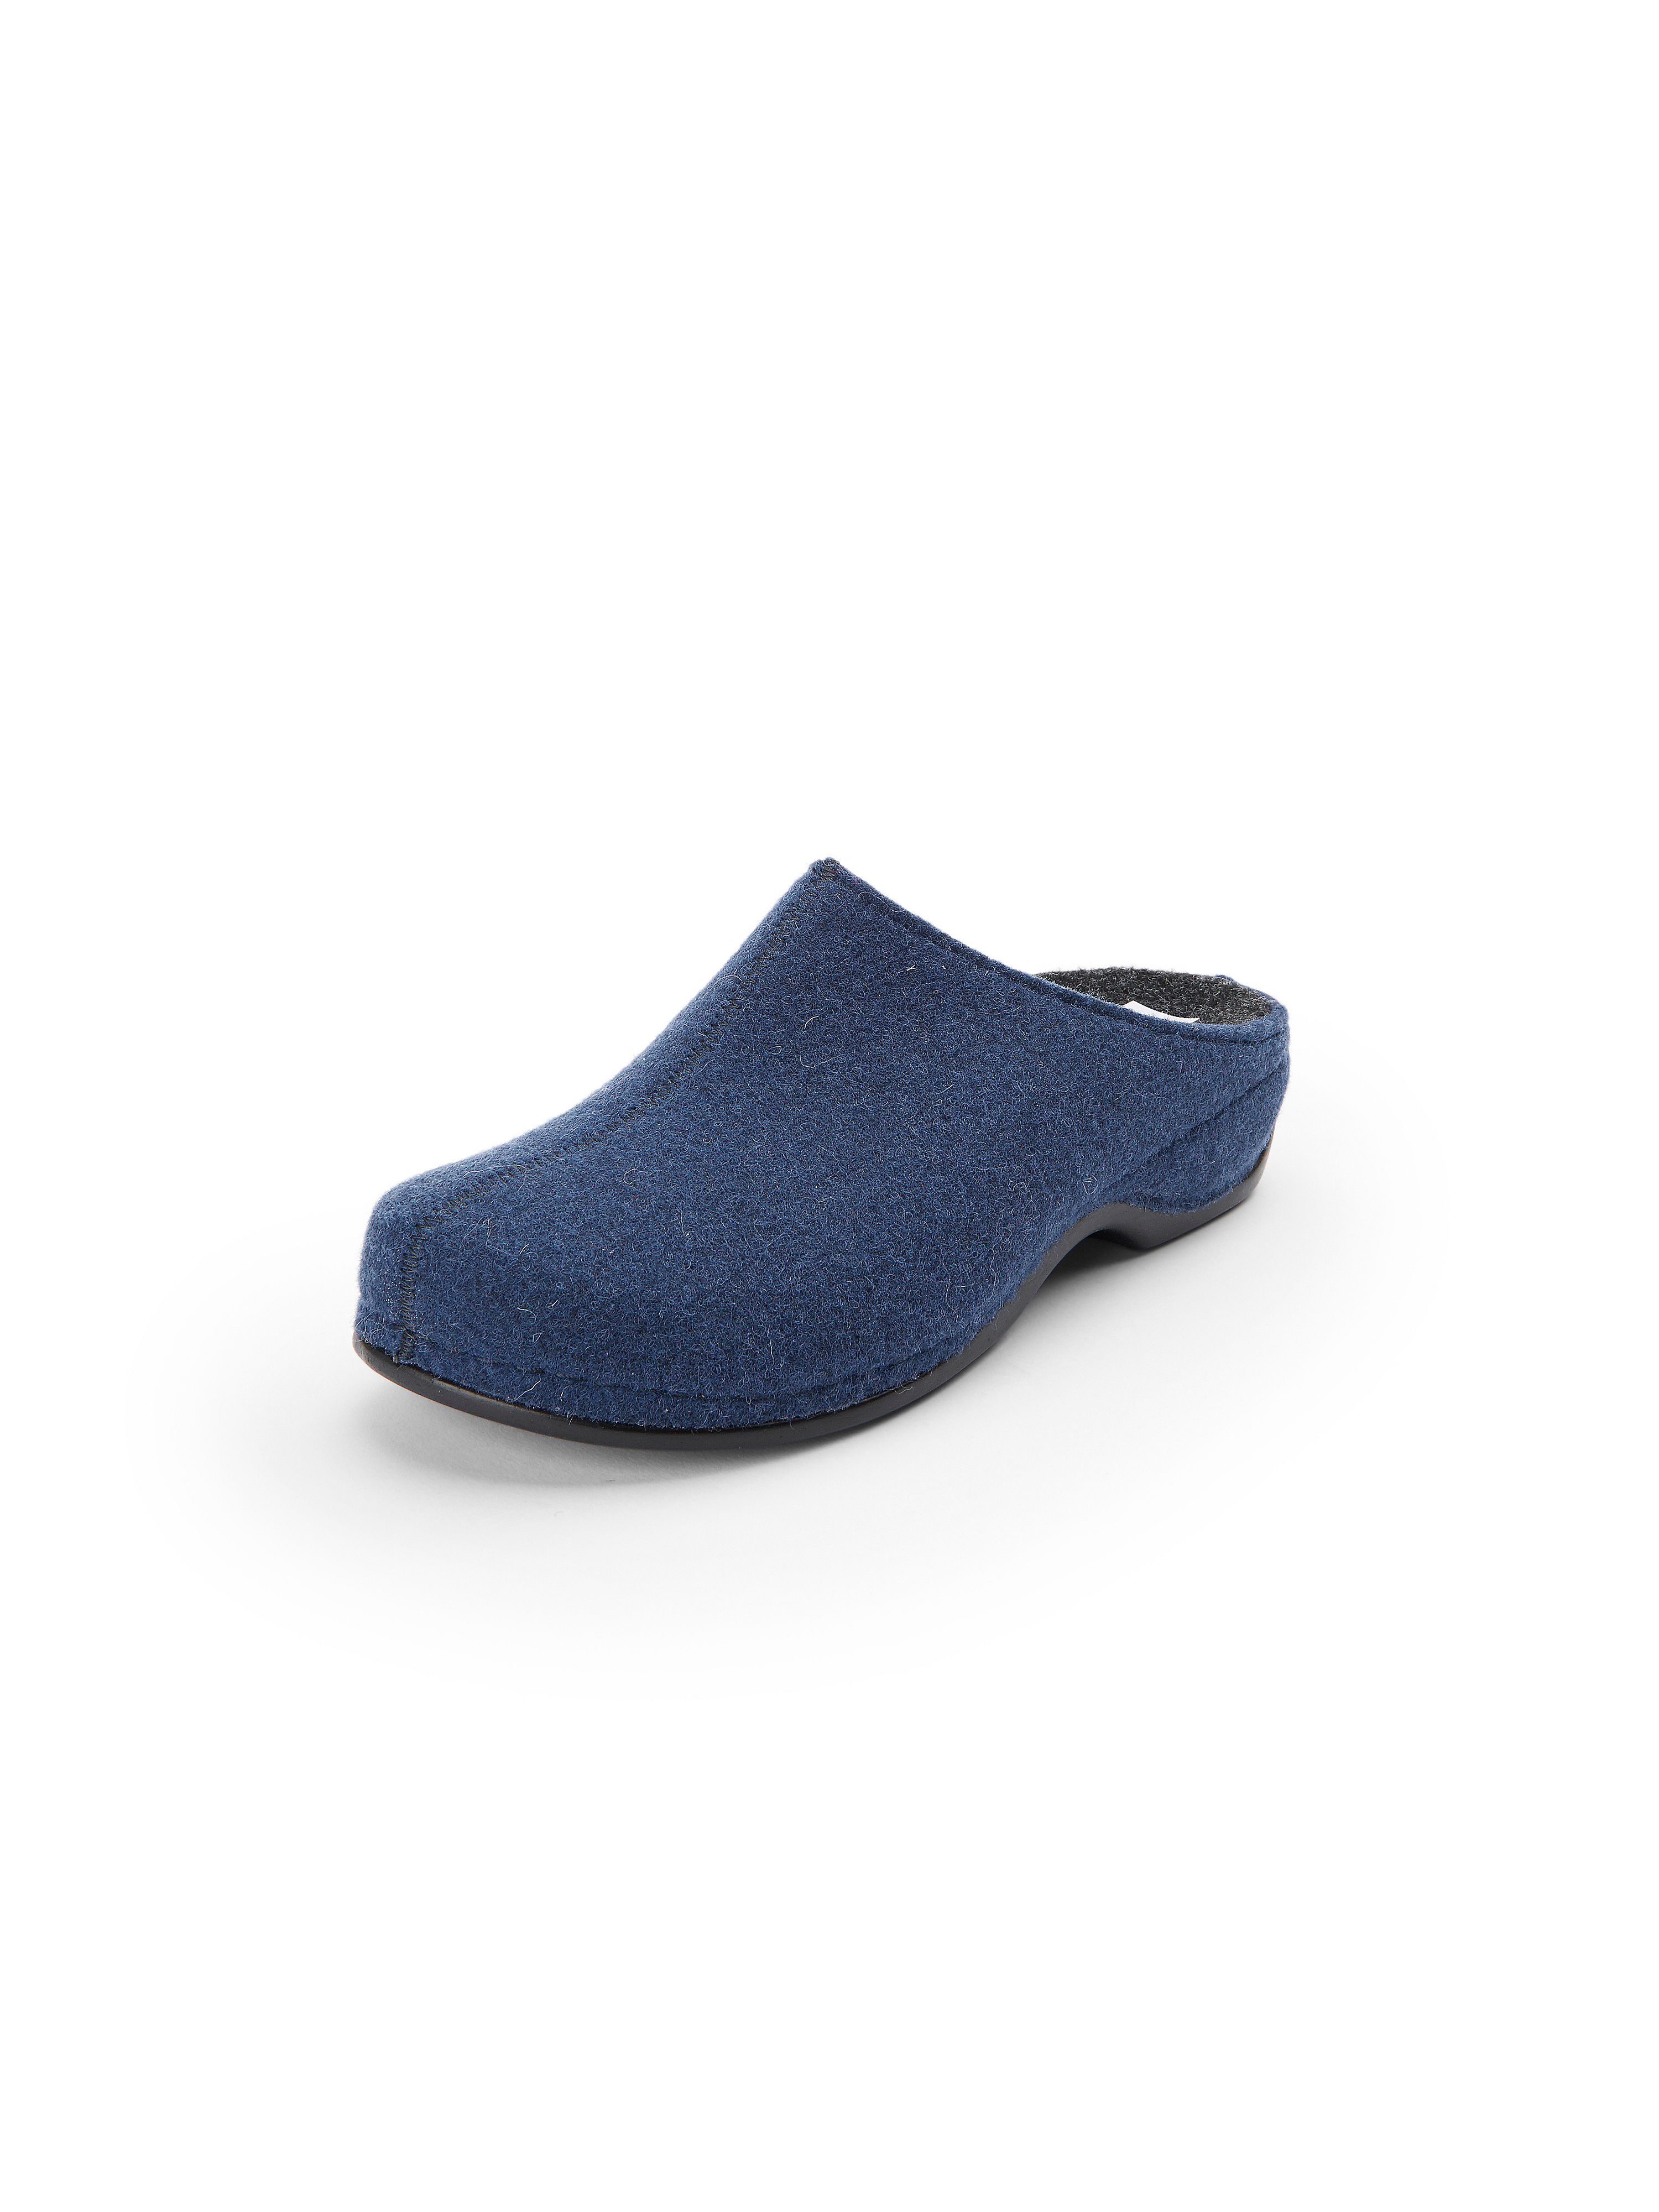 Pantoffels, model Florina Van Berkemann Original blauw